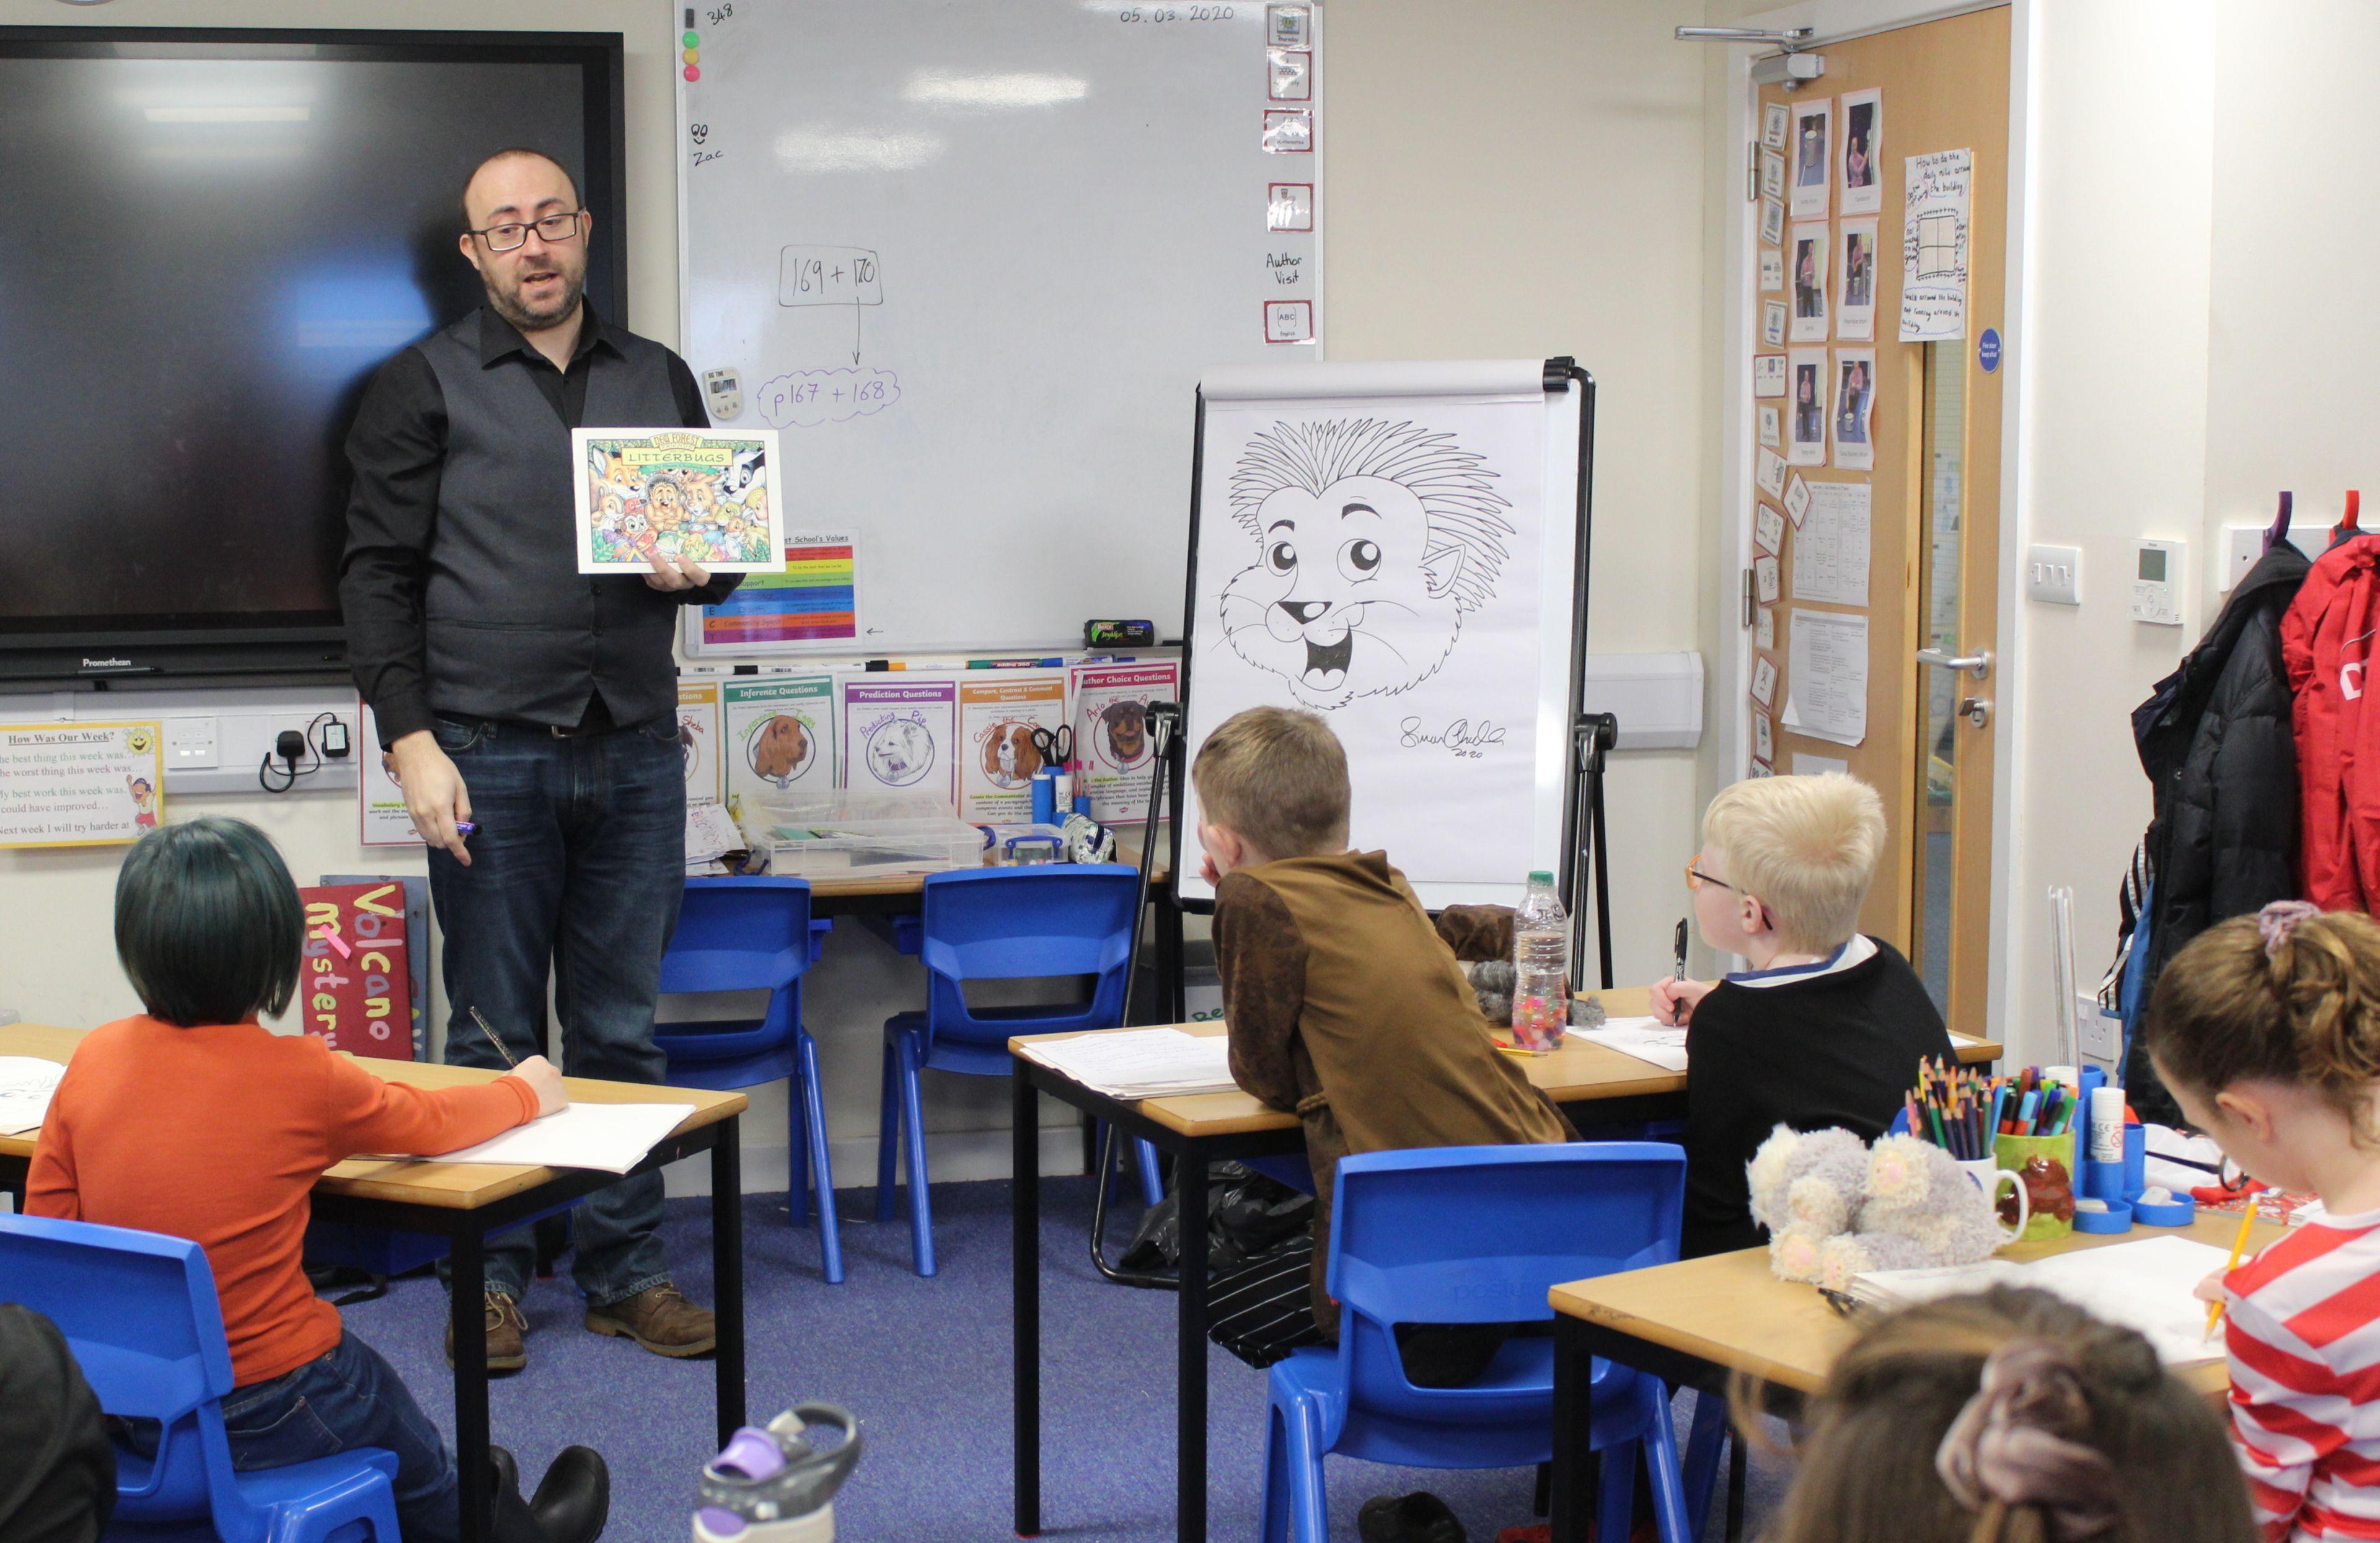 Simon Chadwick with children from Hillside School in Dorset